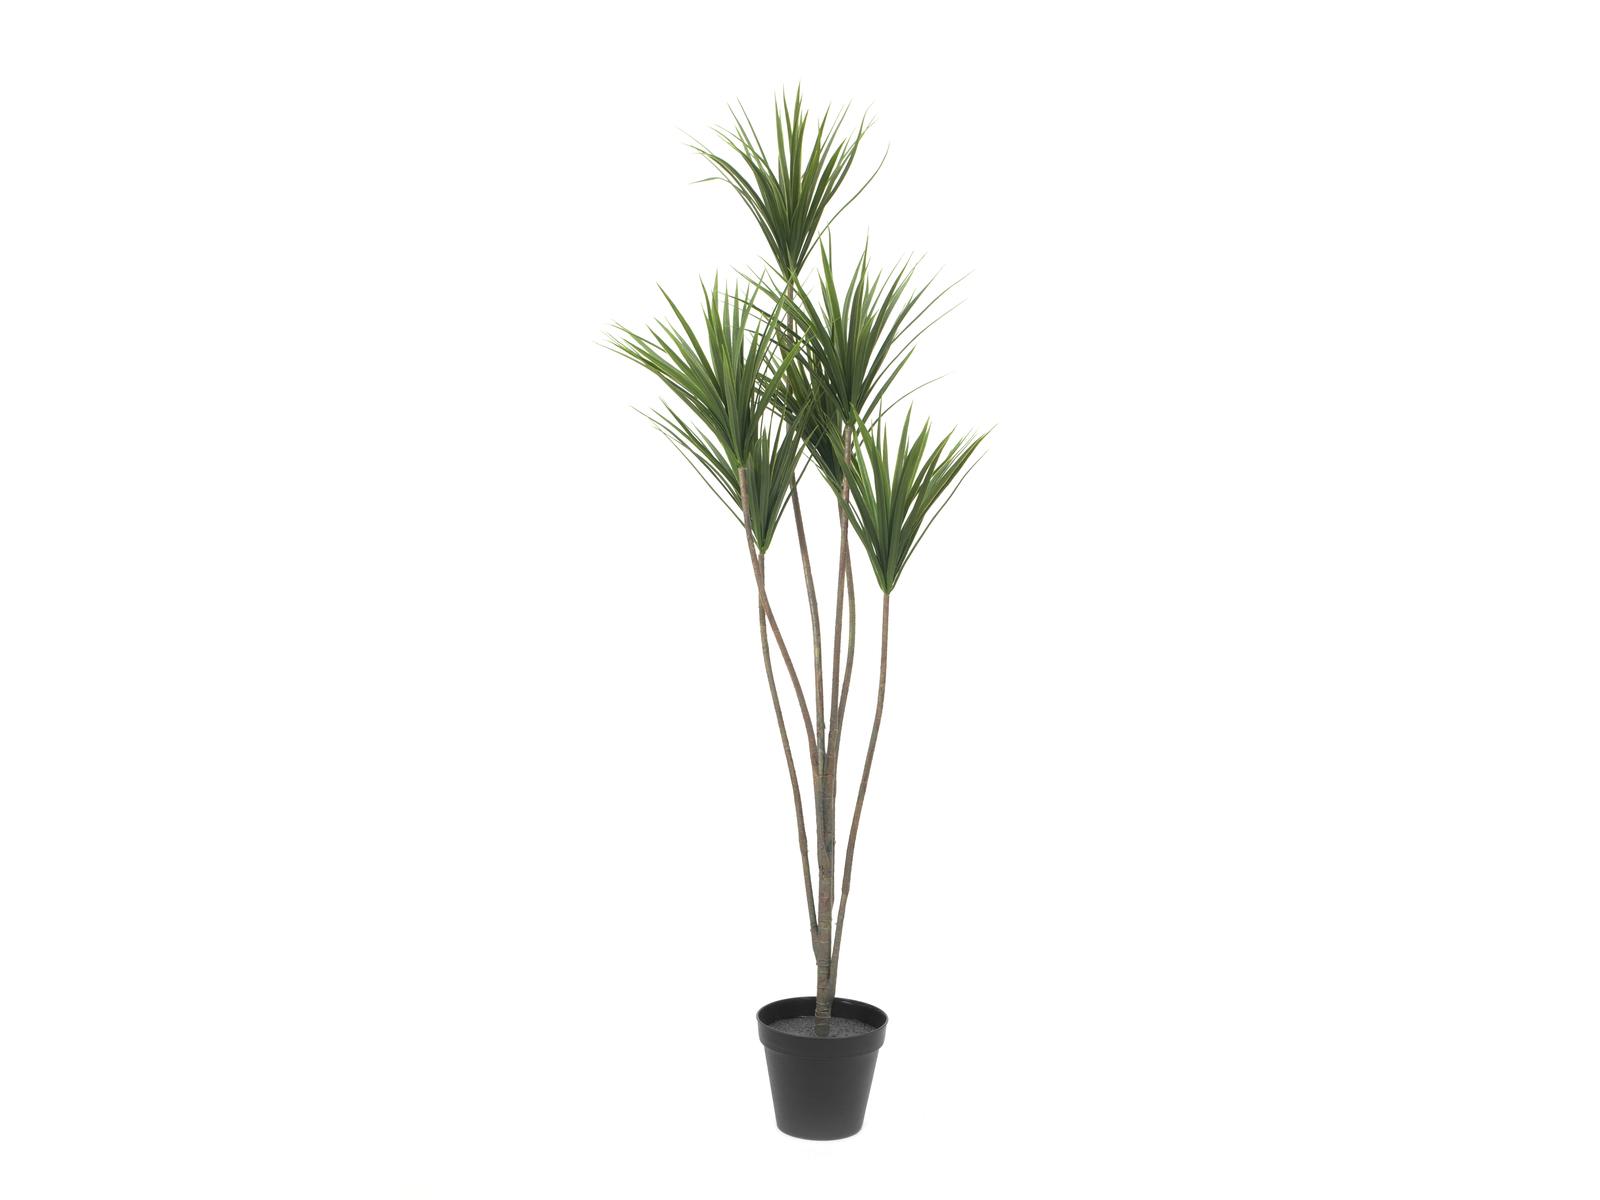 EUROPALMS Yucca palme, piante artificiali, 130cm